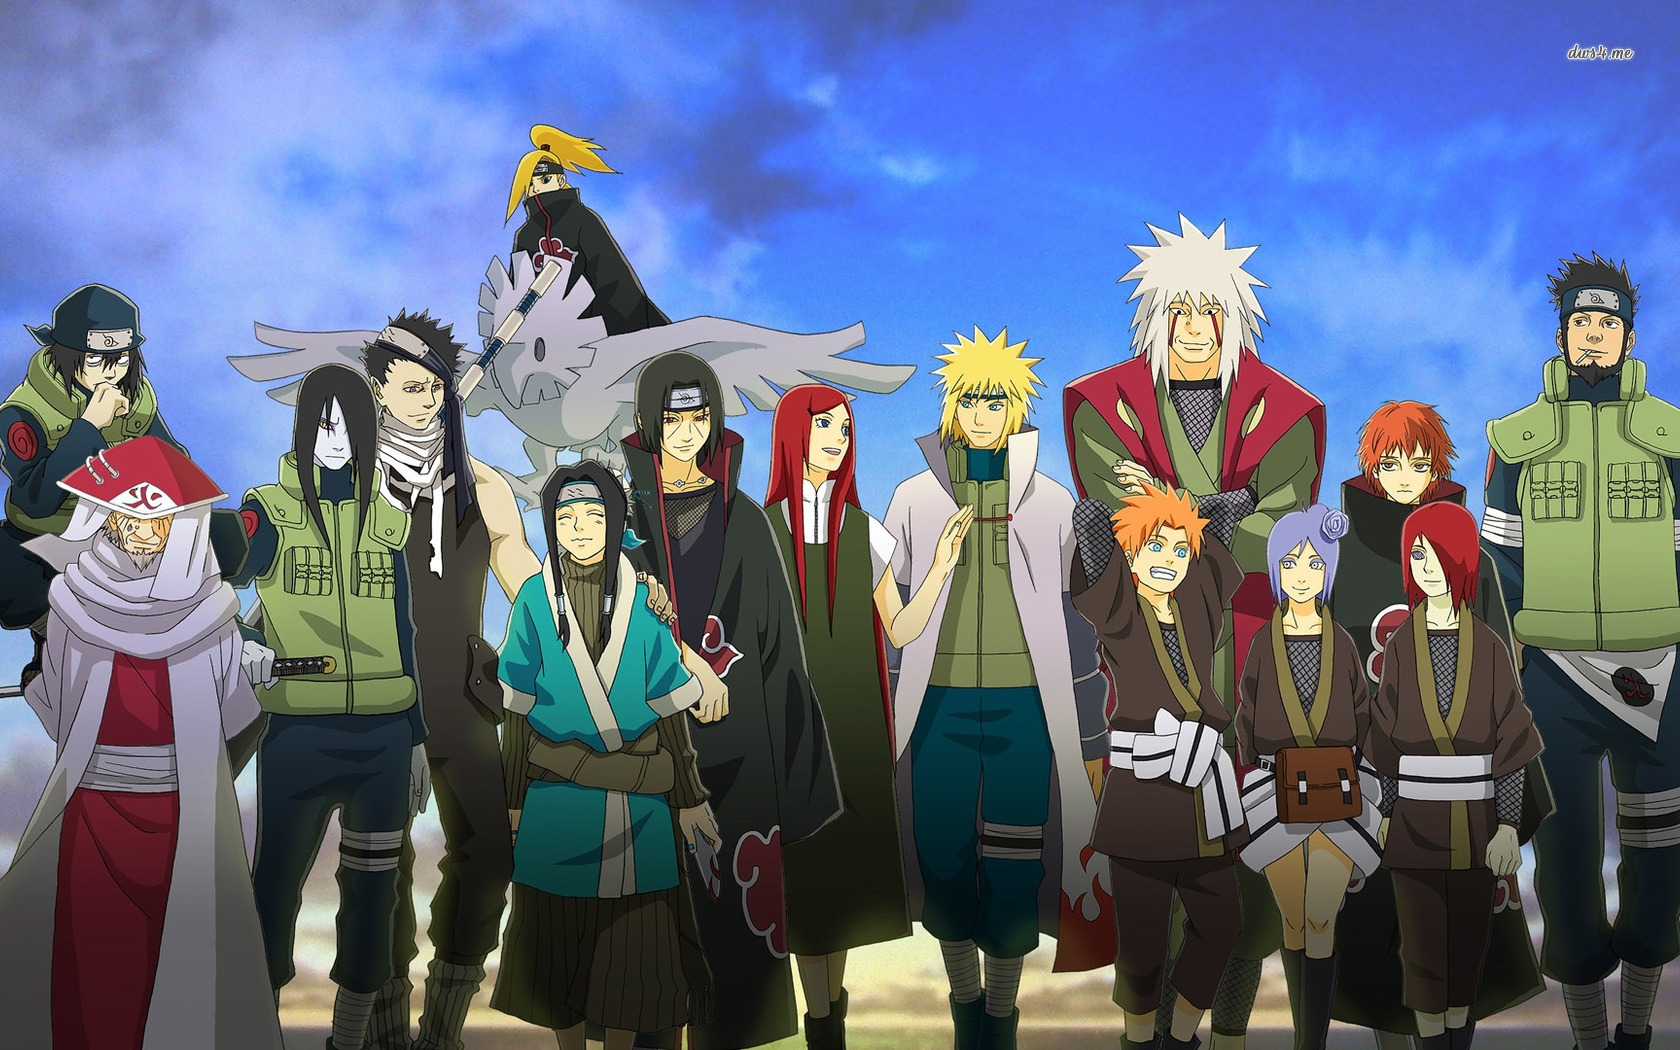 Naruto Characters Wallpapers - WallpaperSafari